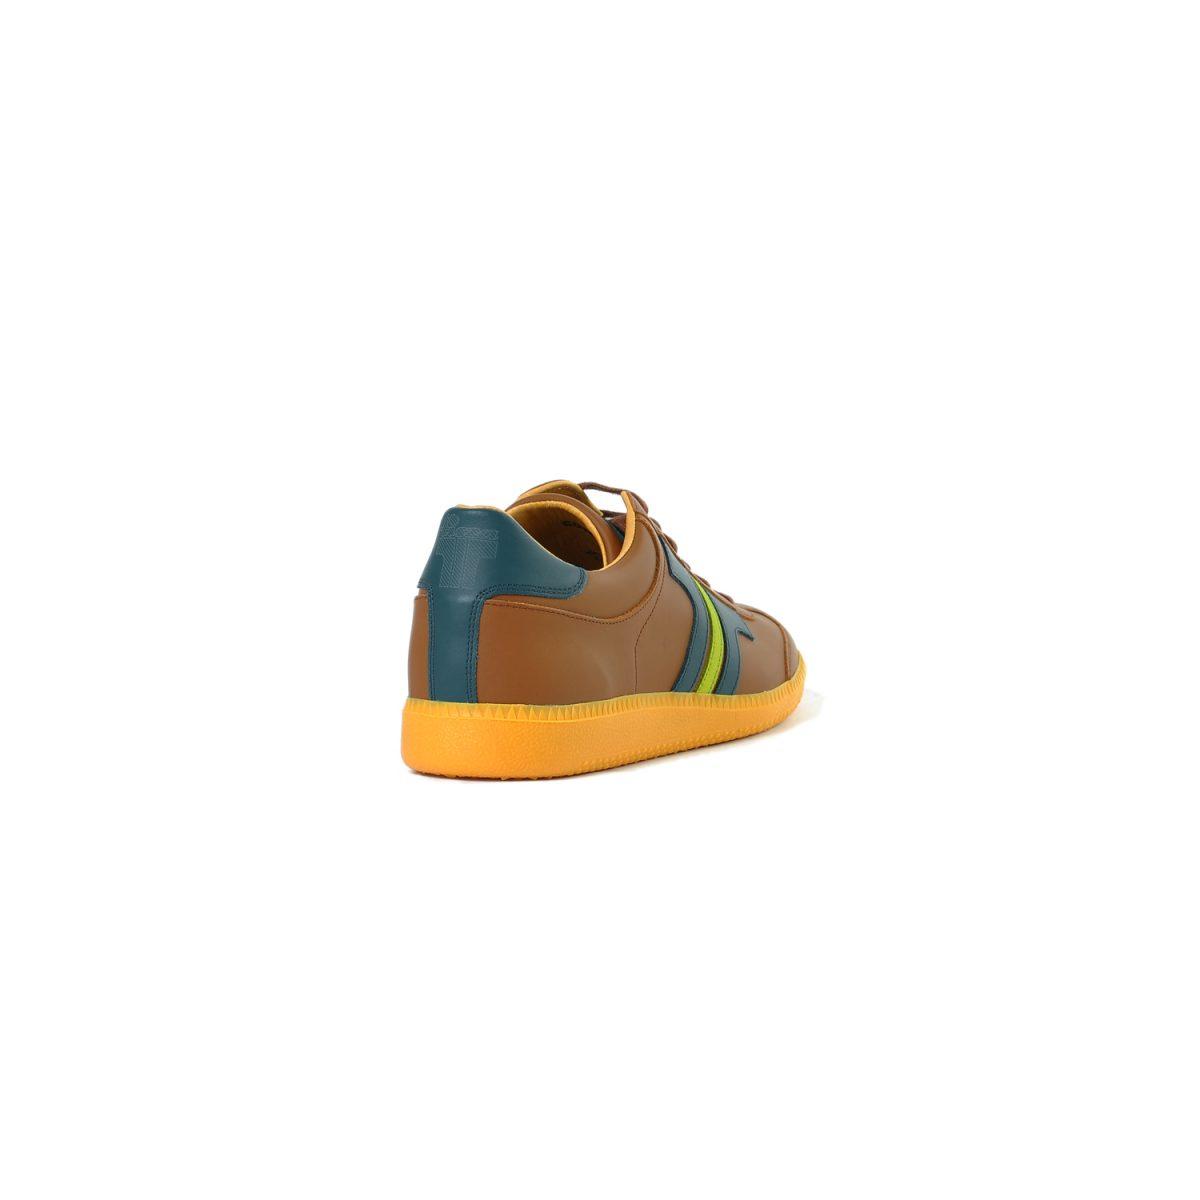 Tisza cipő - Compakt - Bronzbarna-kék korall